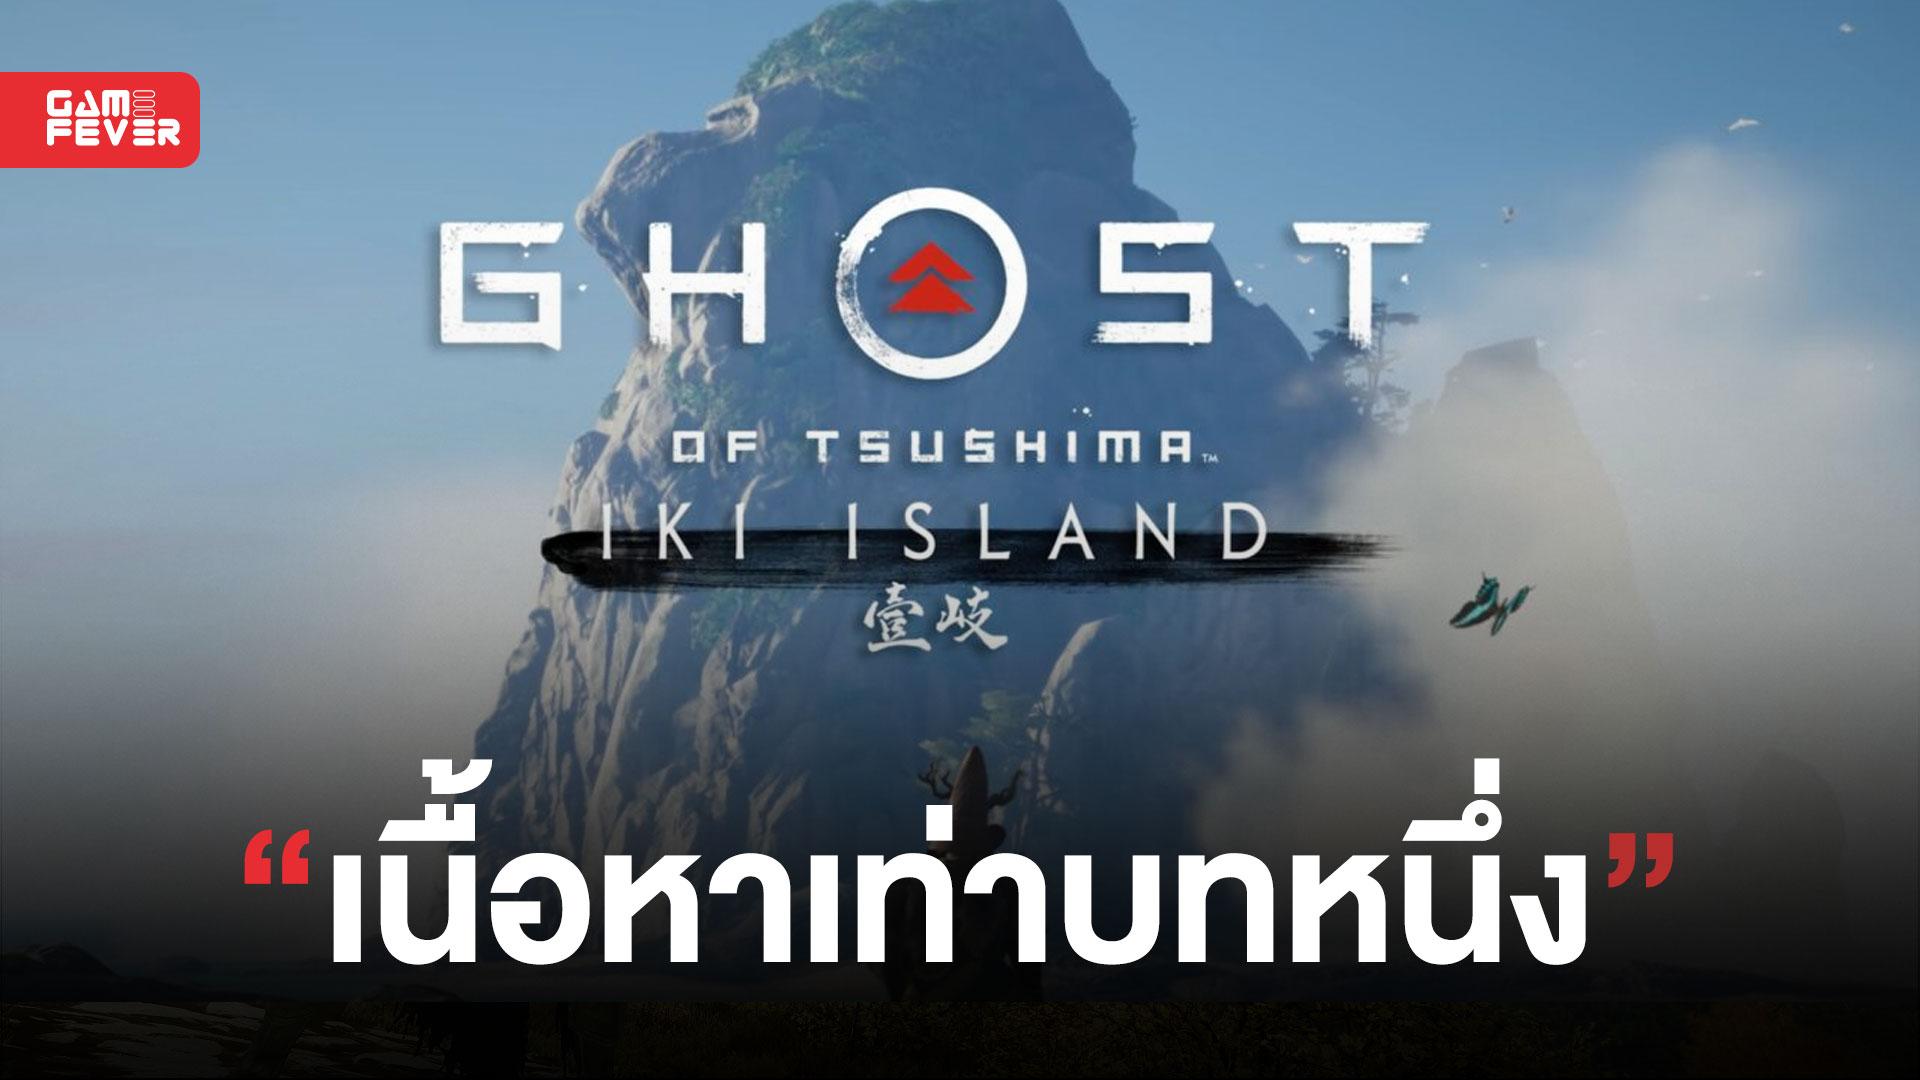 Ghost of Tsushima เผยความยาวบนเกาะ Iki พอๆ กับบทที่หนึ่งของเกมภาคหลัก